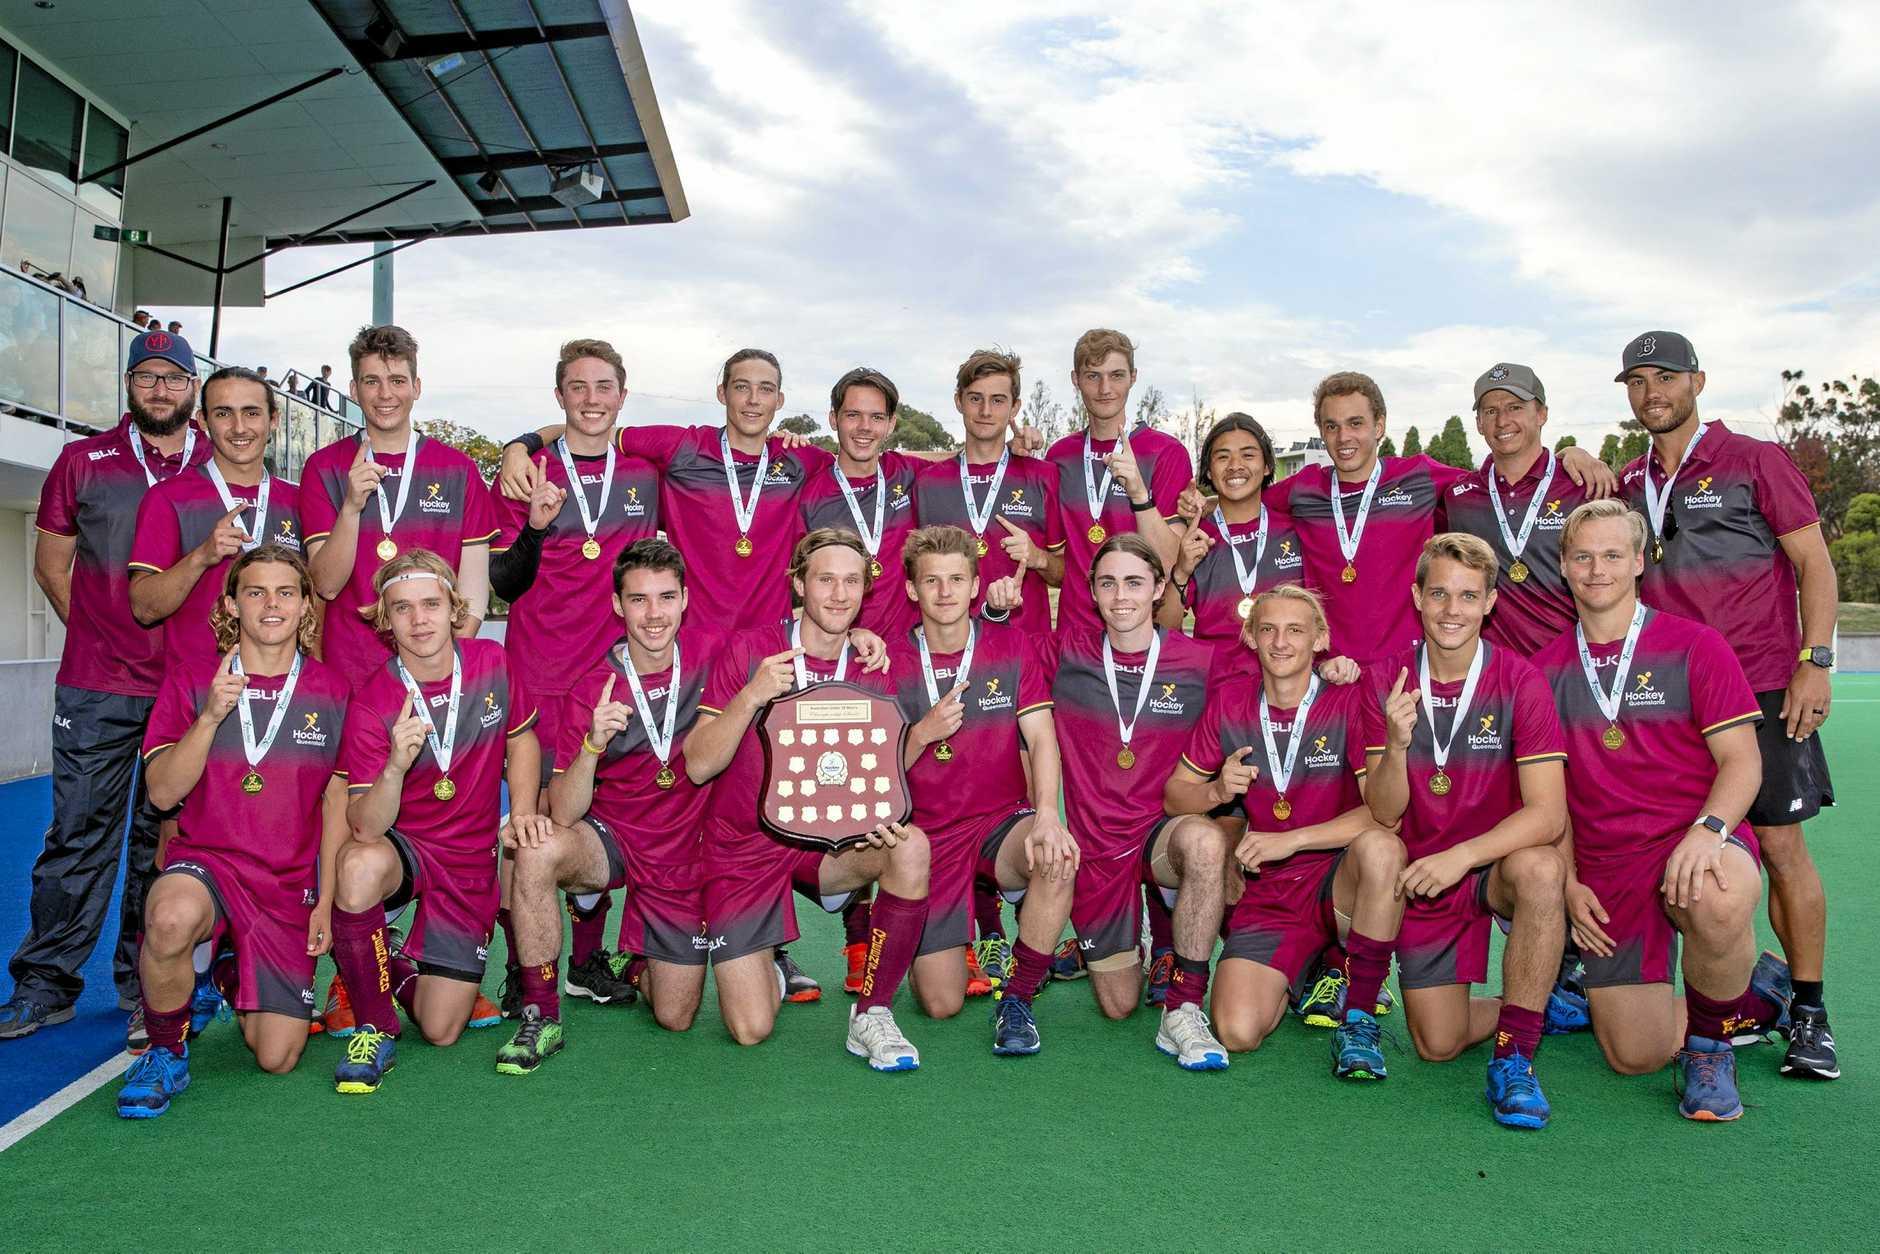 Queensland's 2019 national title-winning hockey team.